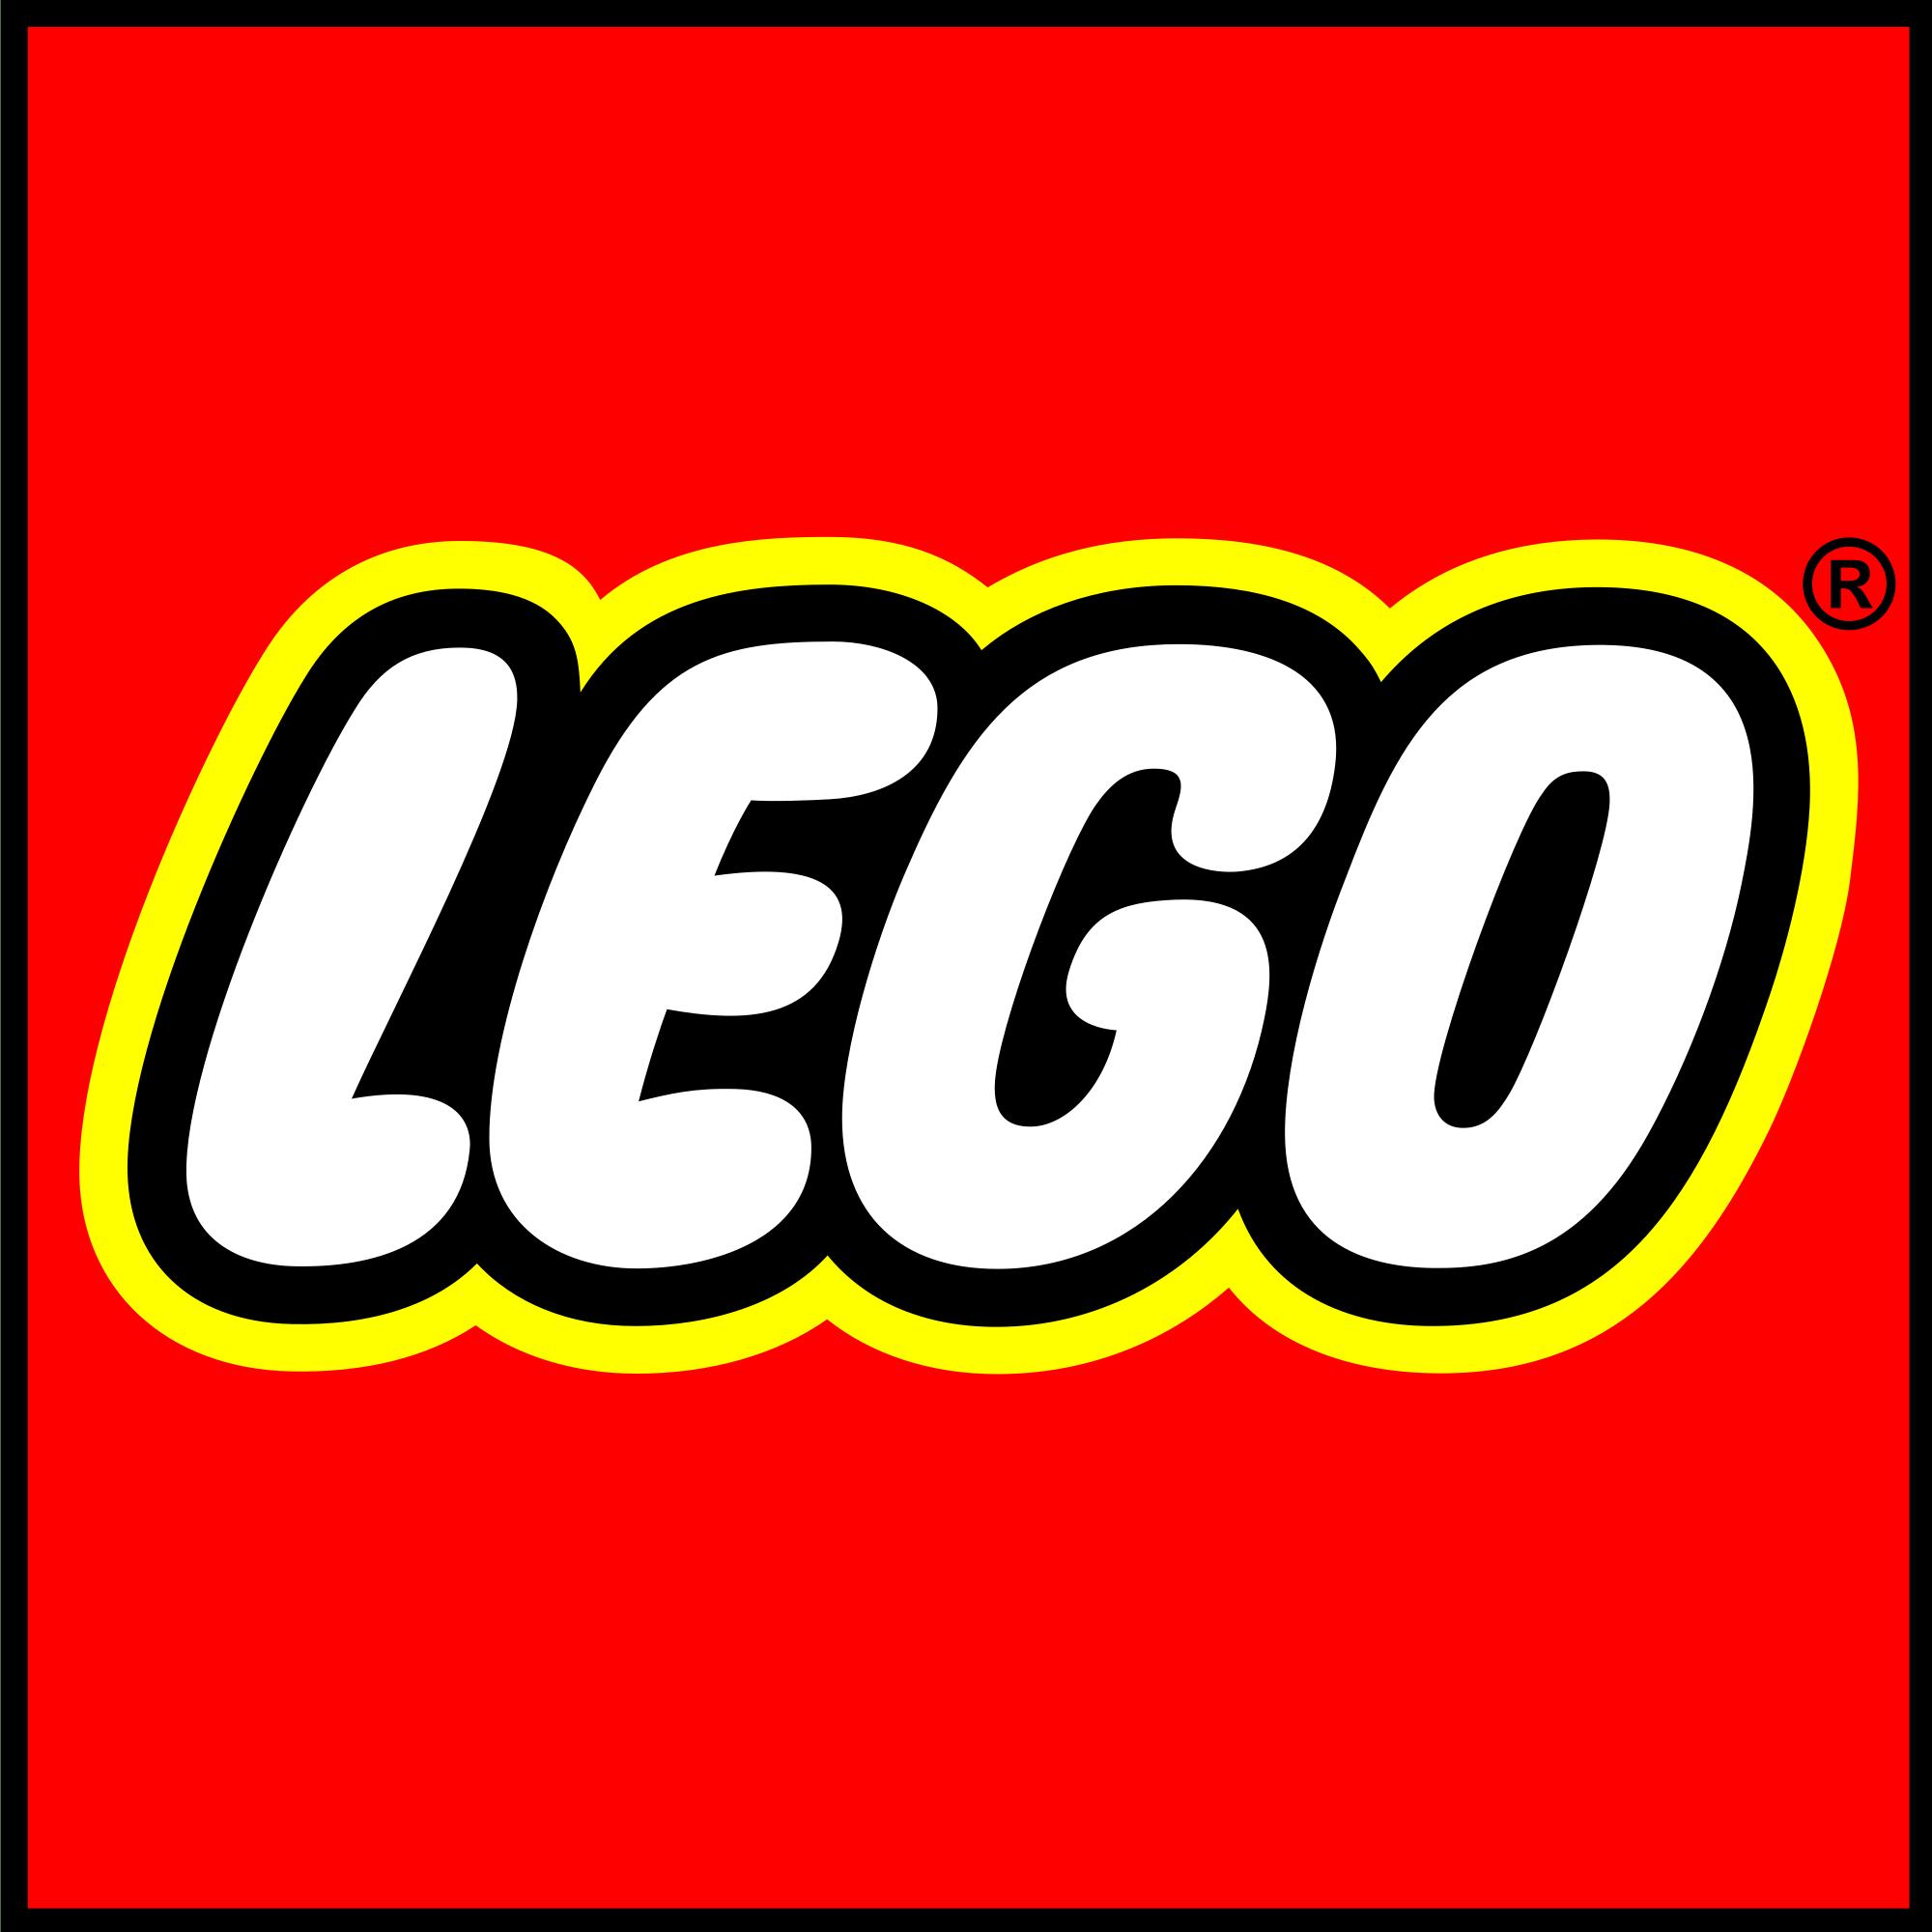 Achat Calendrier Vente 75184 De Wars L'avent Lego® Star XTlwkZiuOP